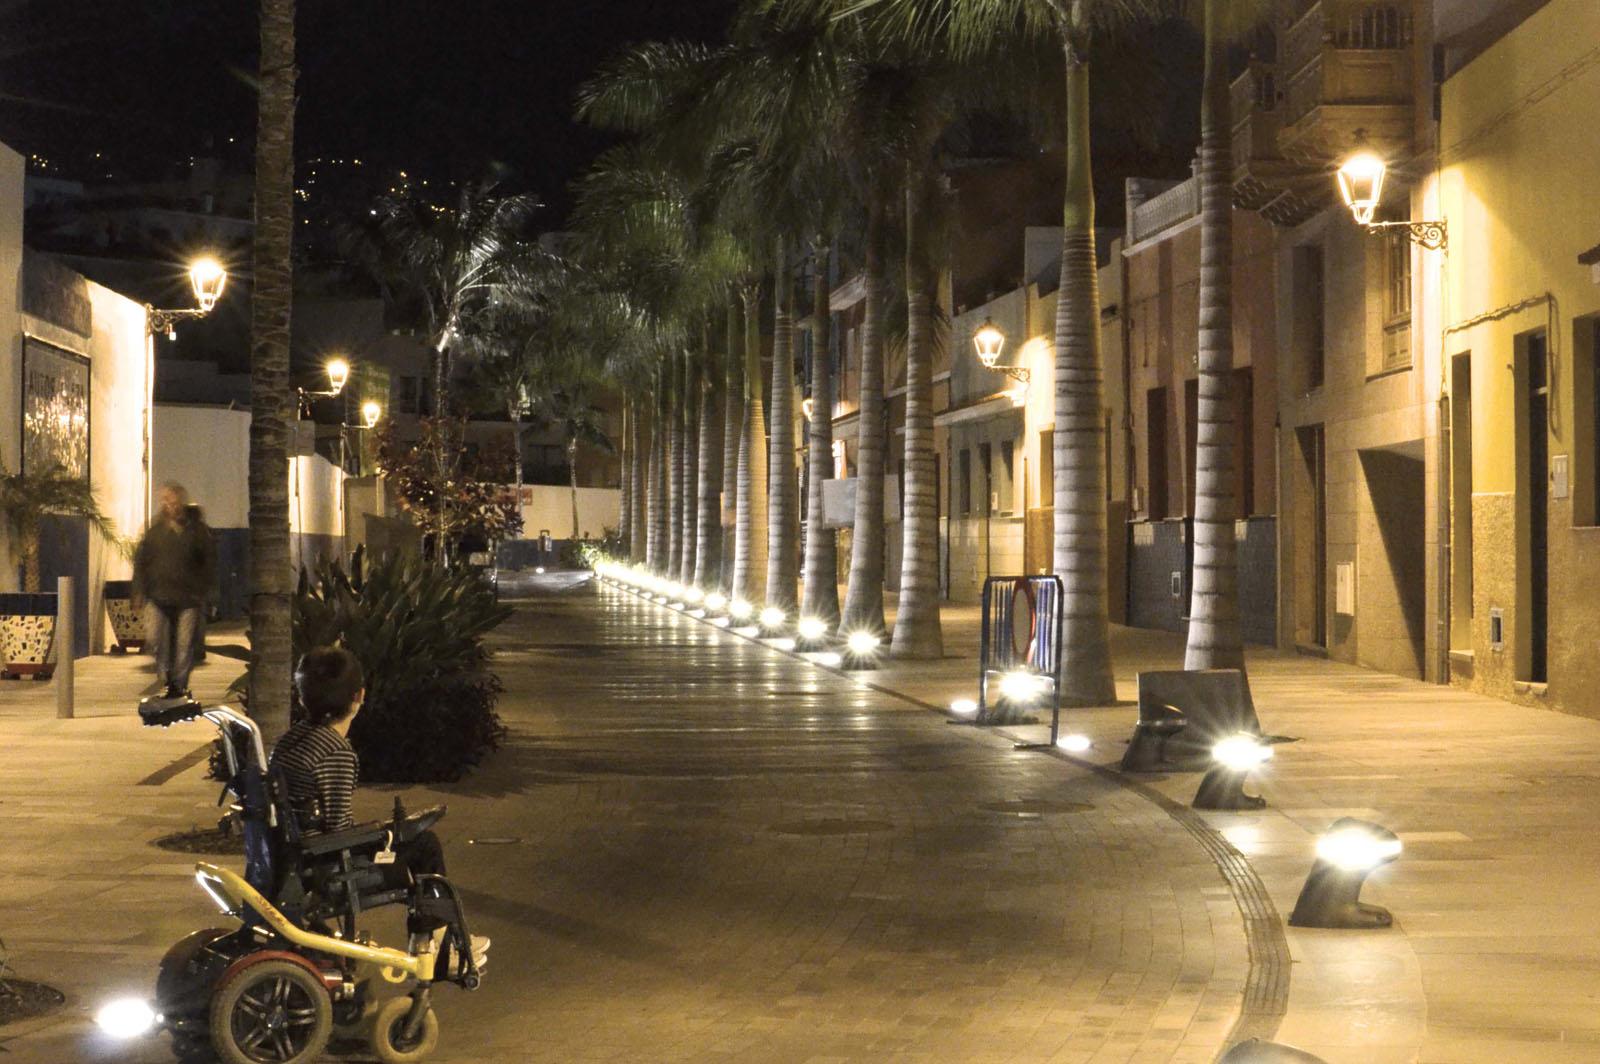 Vista de nocturna de calle iluminada accesible